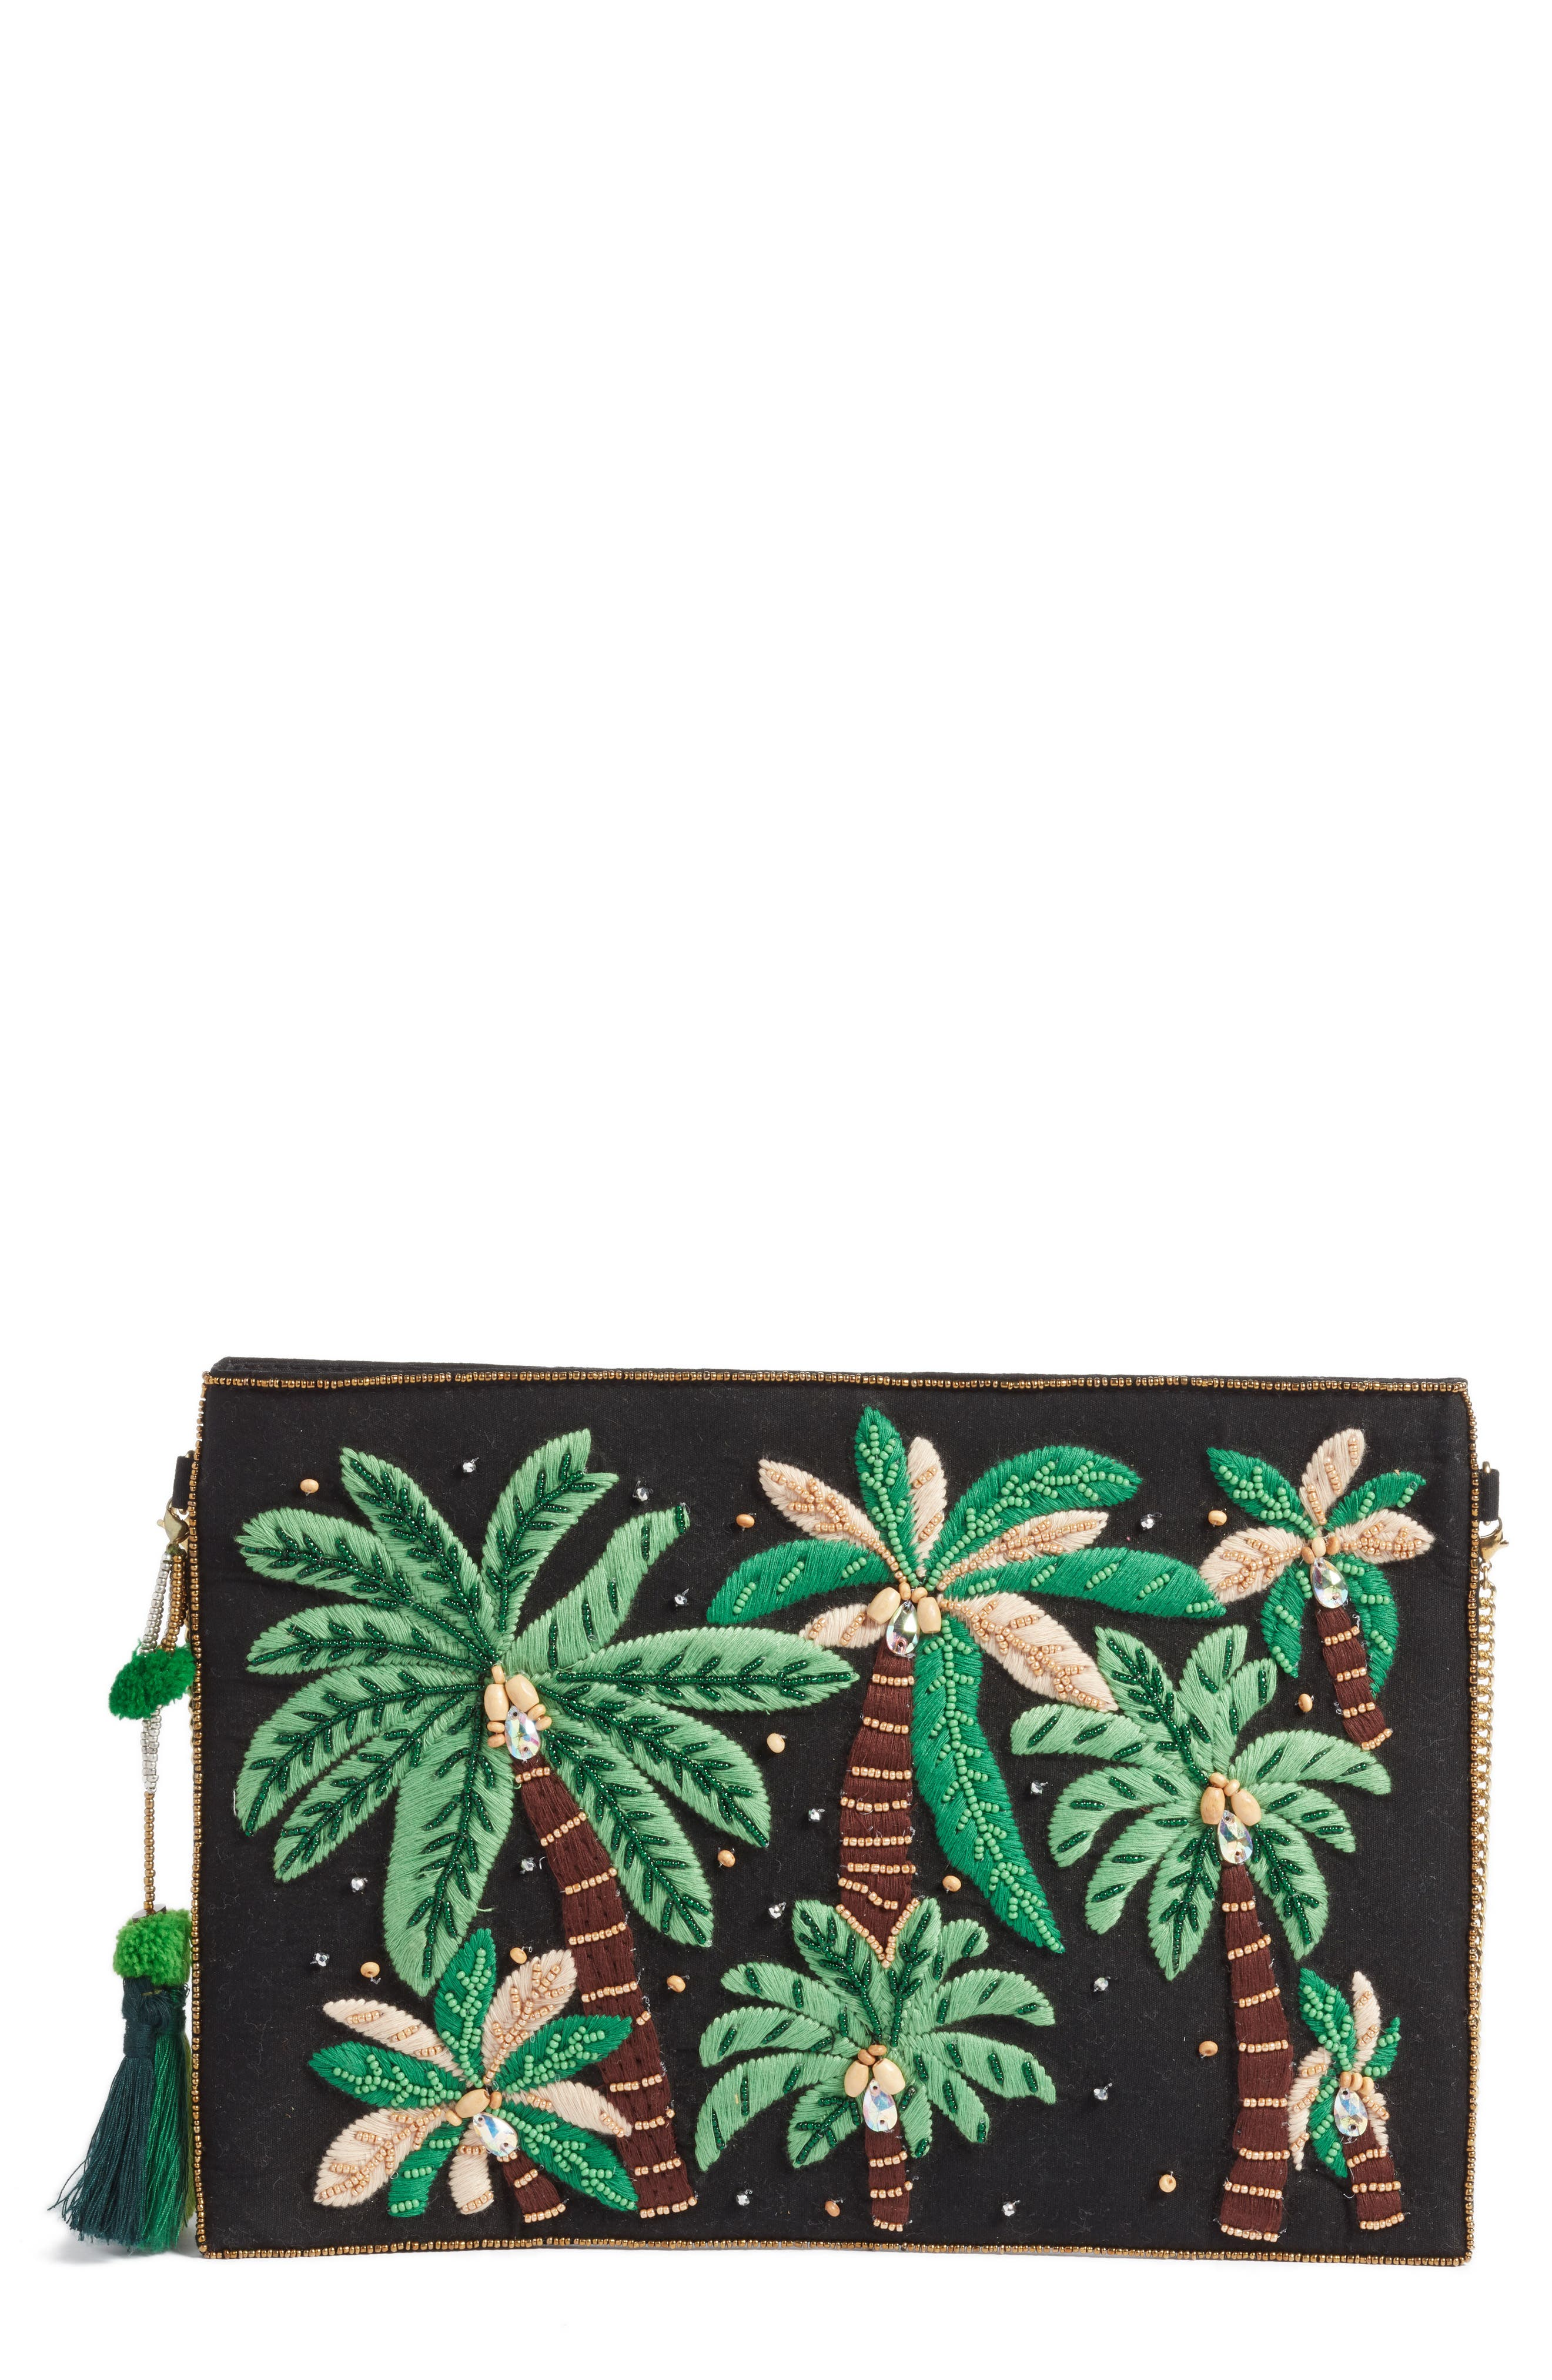 AREA STARS Embroidered Palm Tree Crossbody Bag - Black